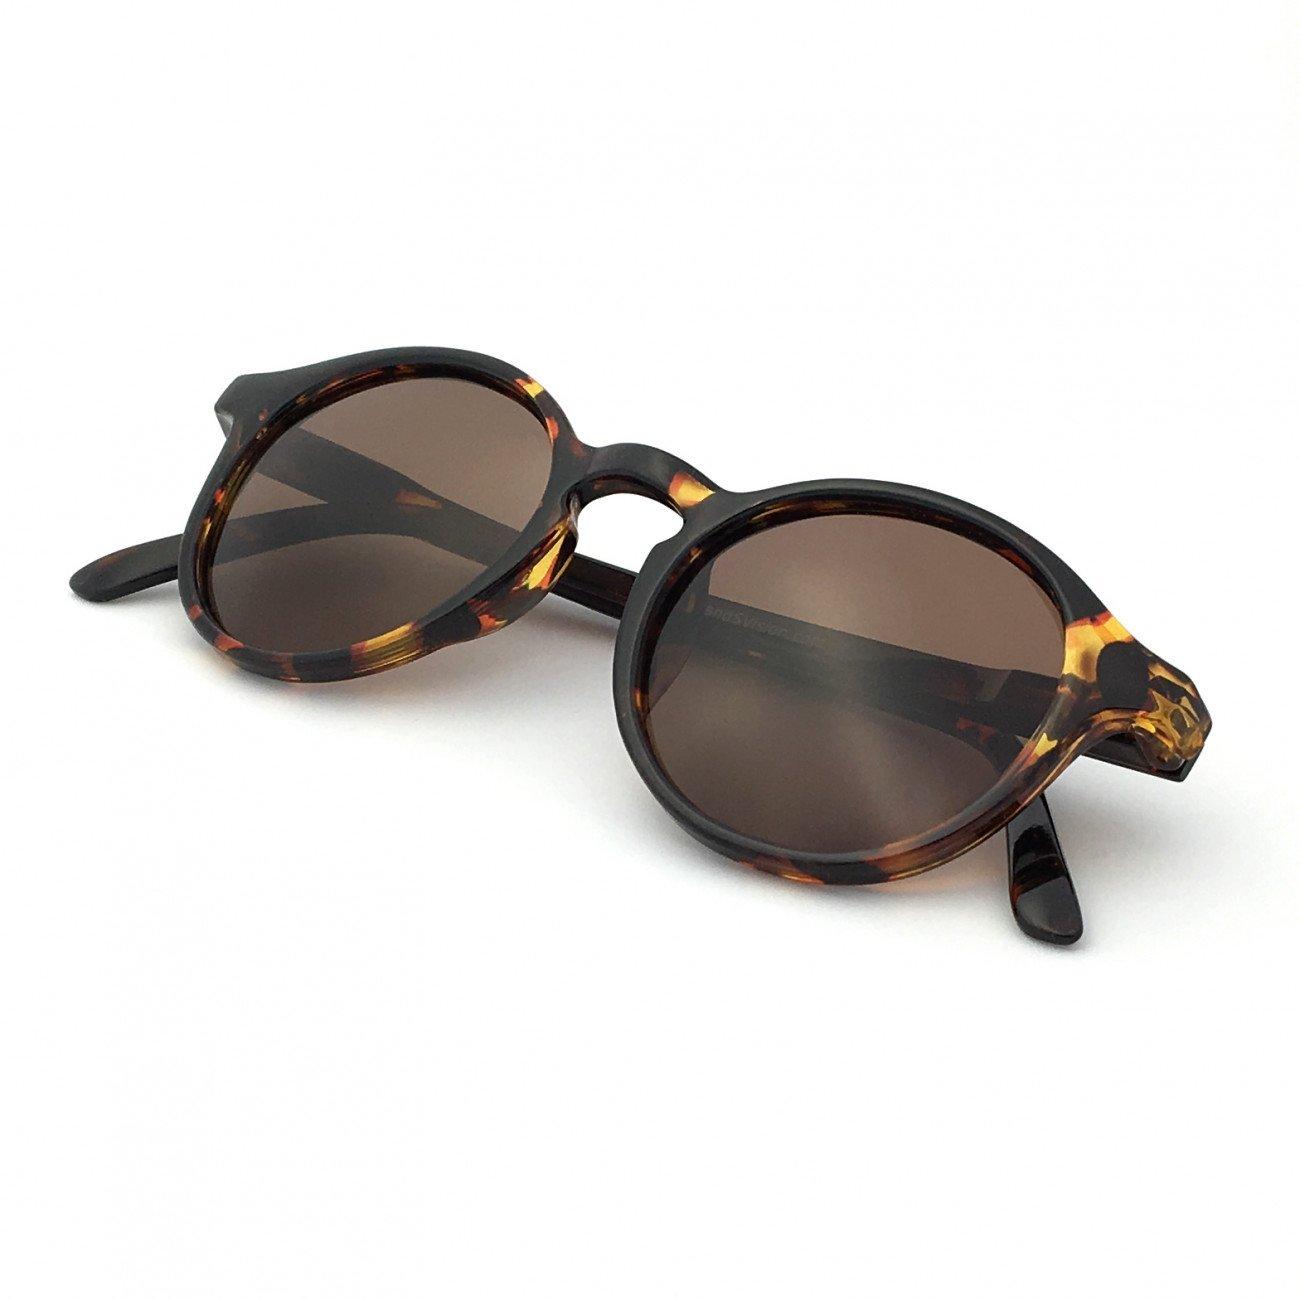 c7bbda82e273 J+S Hali Retro Round Sunglasses